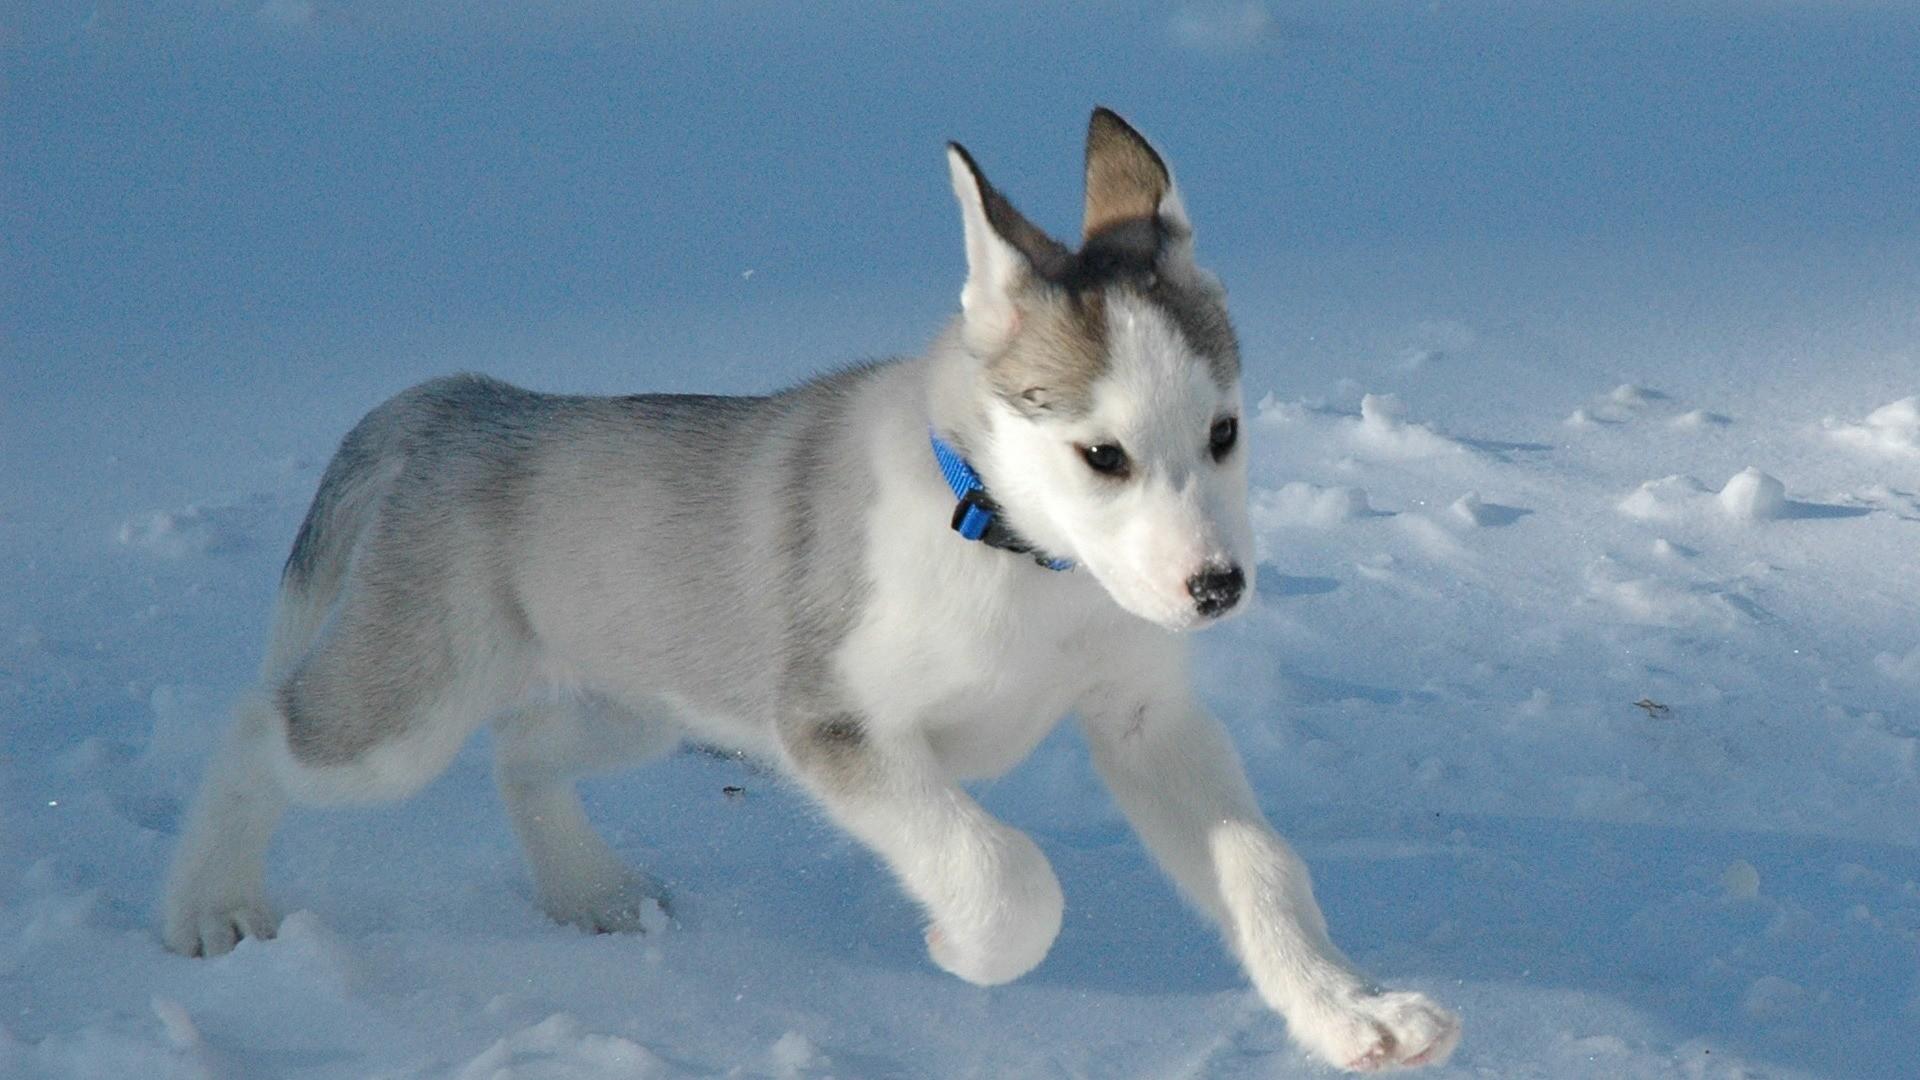 Husky Wallpaper Dogs Animals Wallpapers